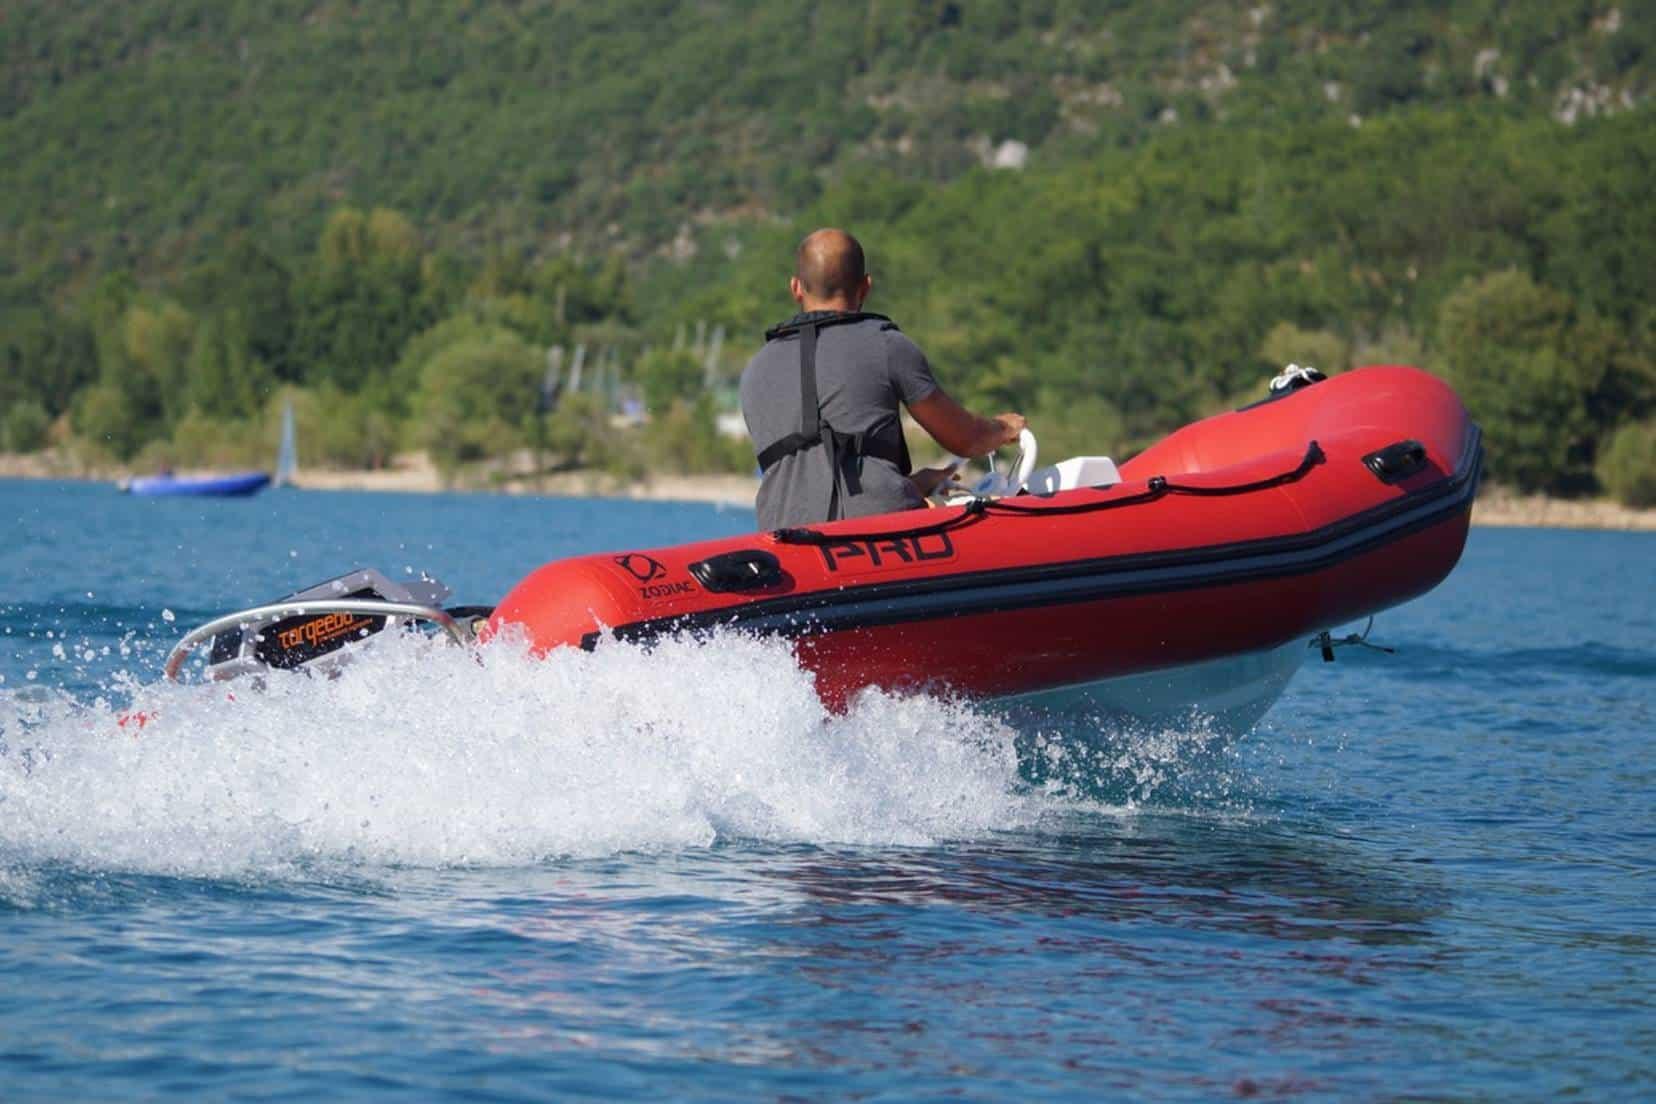 Torqeedo Cruise 10R